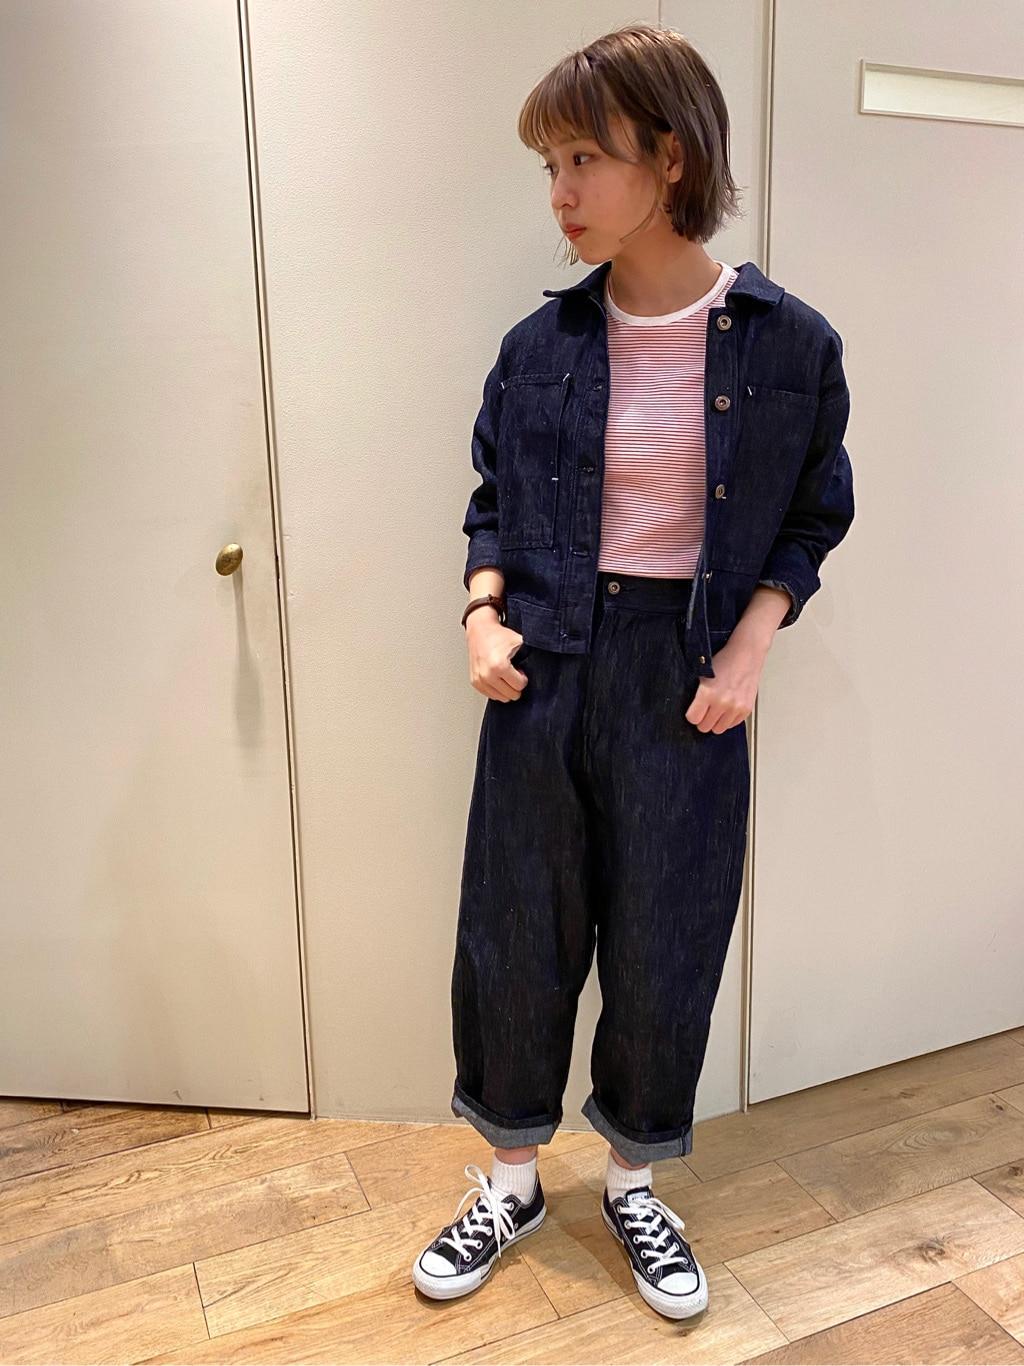 bulle de savon 新宿ミロード 身長:157cm 2020.09.09